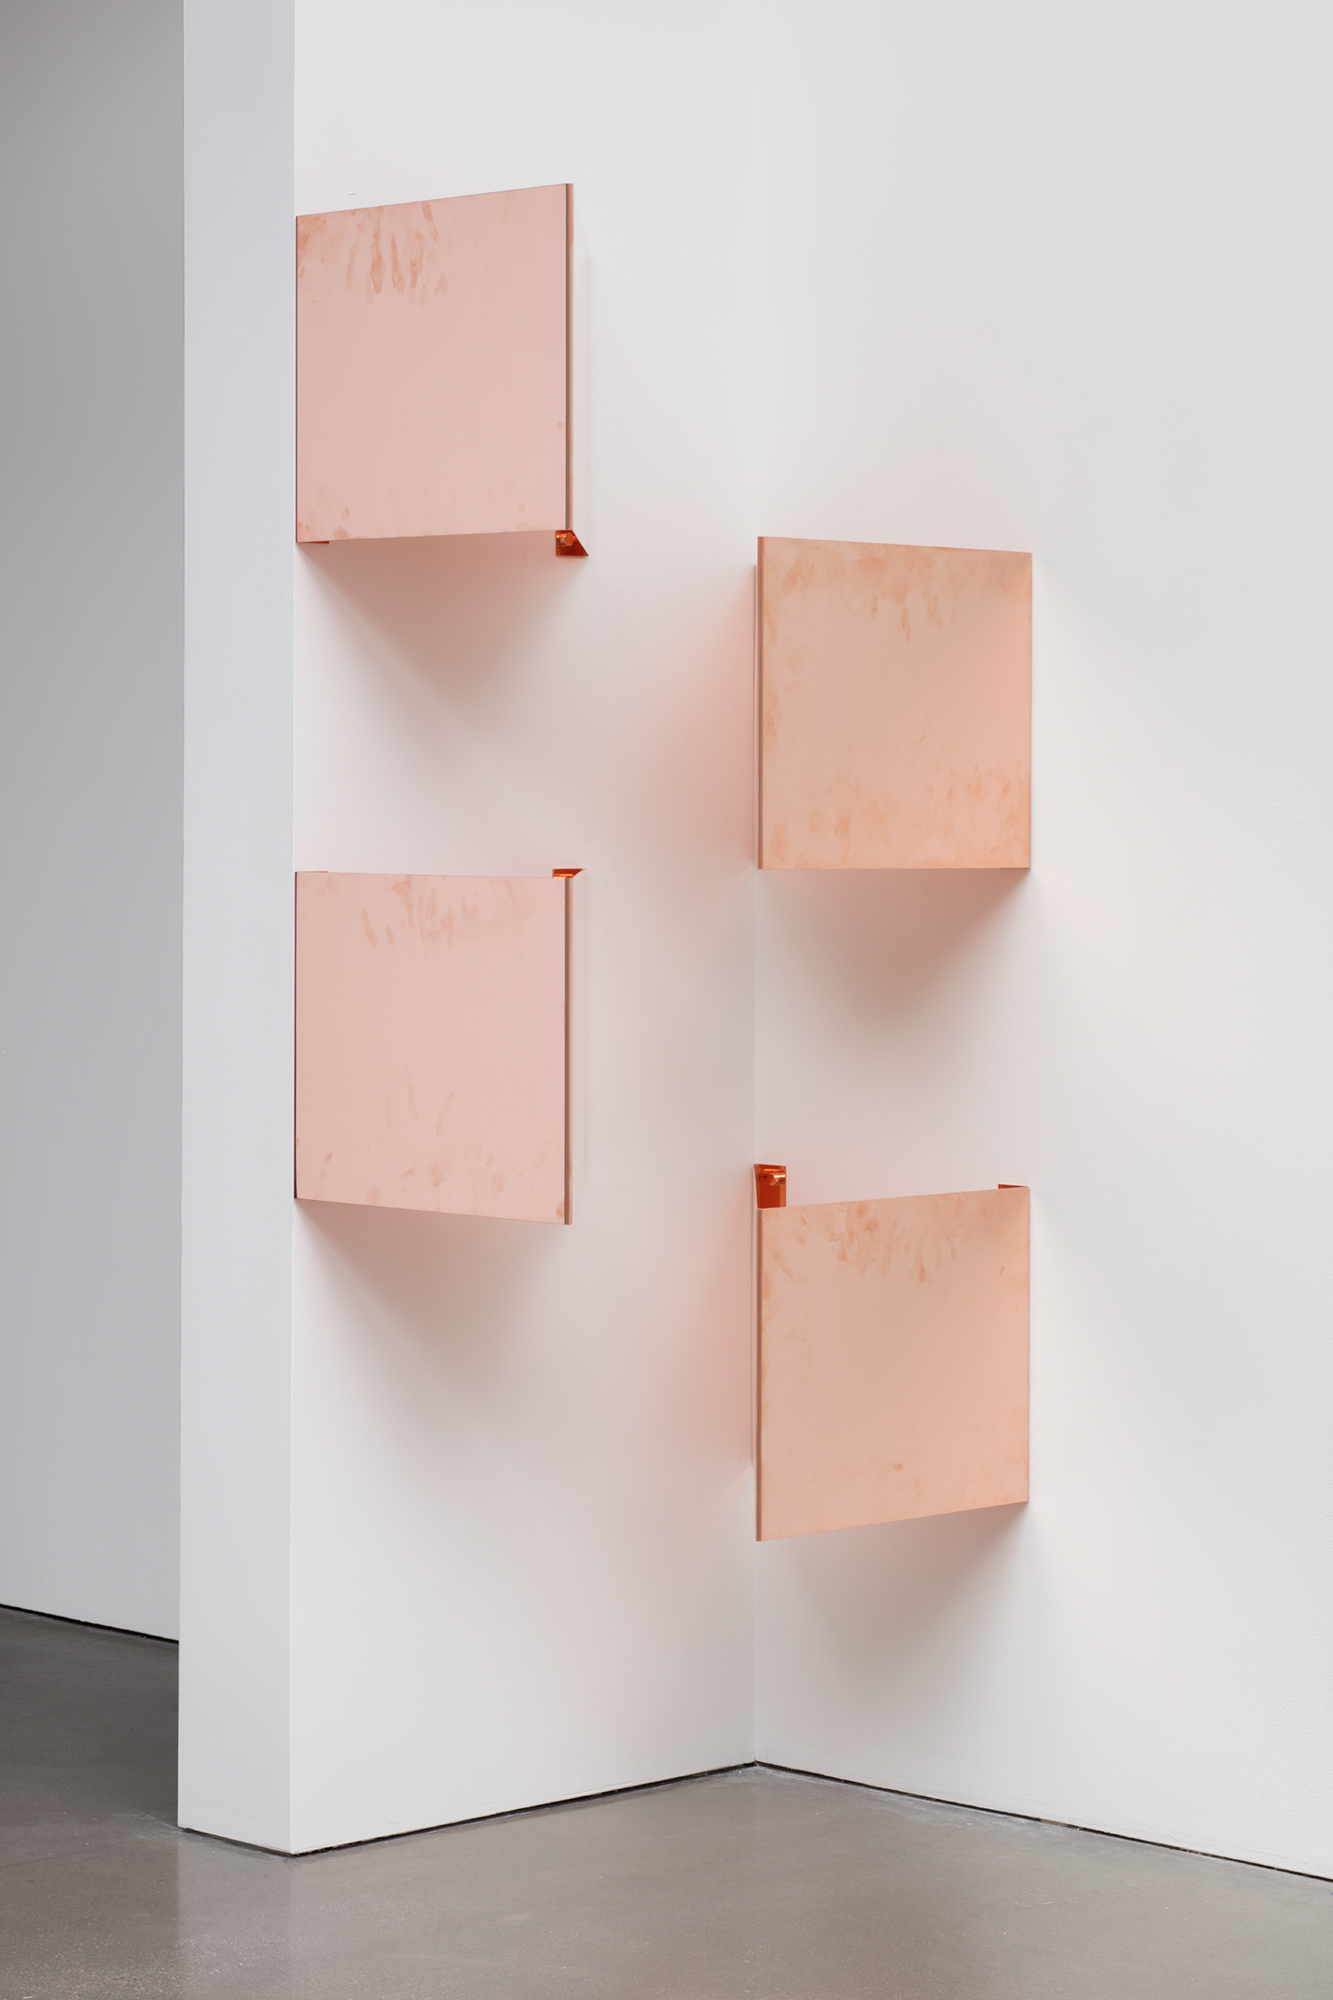 "Copper Surrogates (48"" x 120"" 48 ounce C11000 Copper Alloy, 45º/45º/90º, February 23–27/April 9, 2018, Los Angeles, California)    2018–   Polished copper  18 1/2 x 14 1/16 x 18 1/2 inches each, 4 parts   Surrogates (Modular, Art Handling), 2014–    Equivalents, 2018"